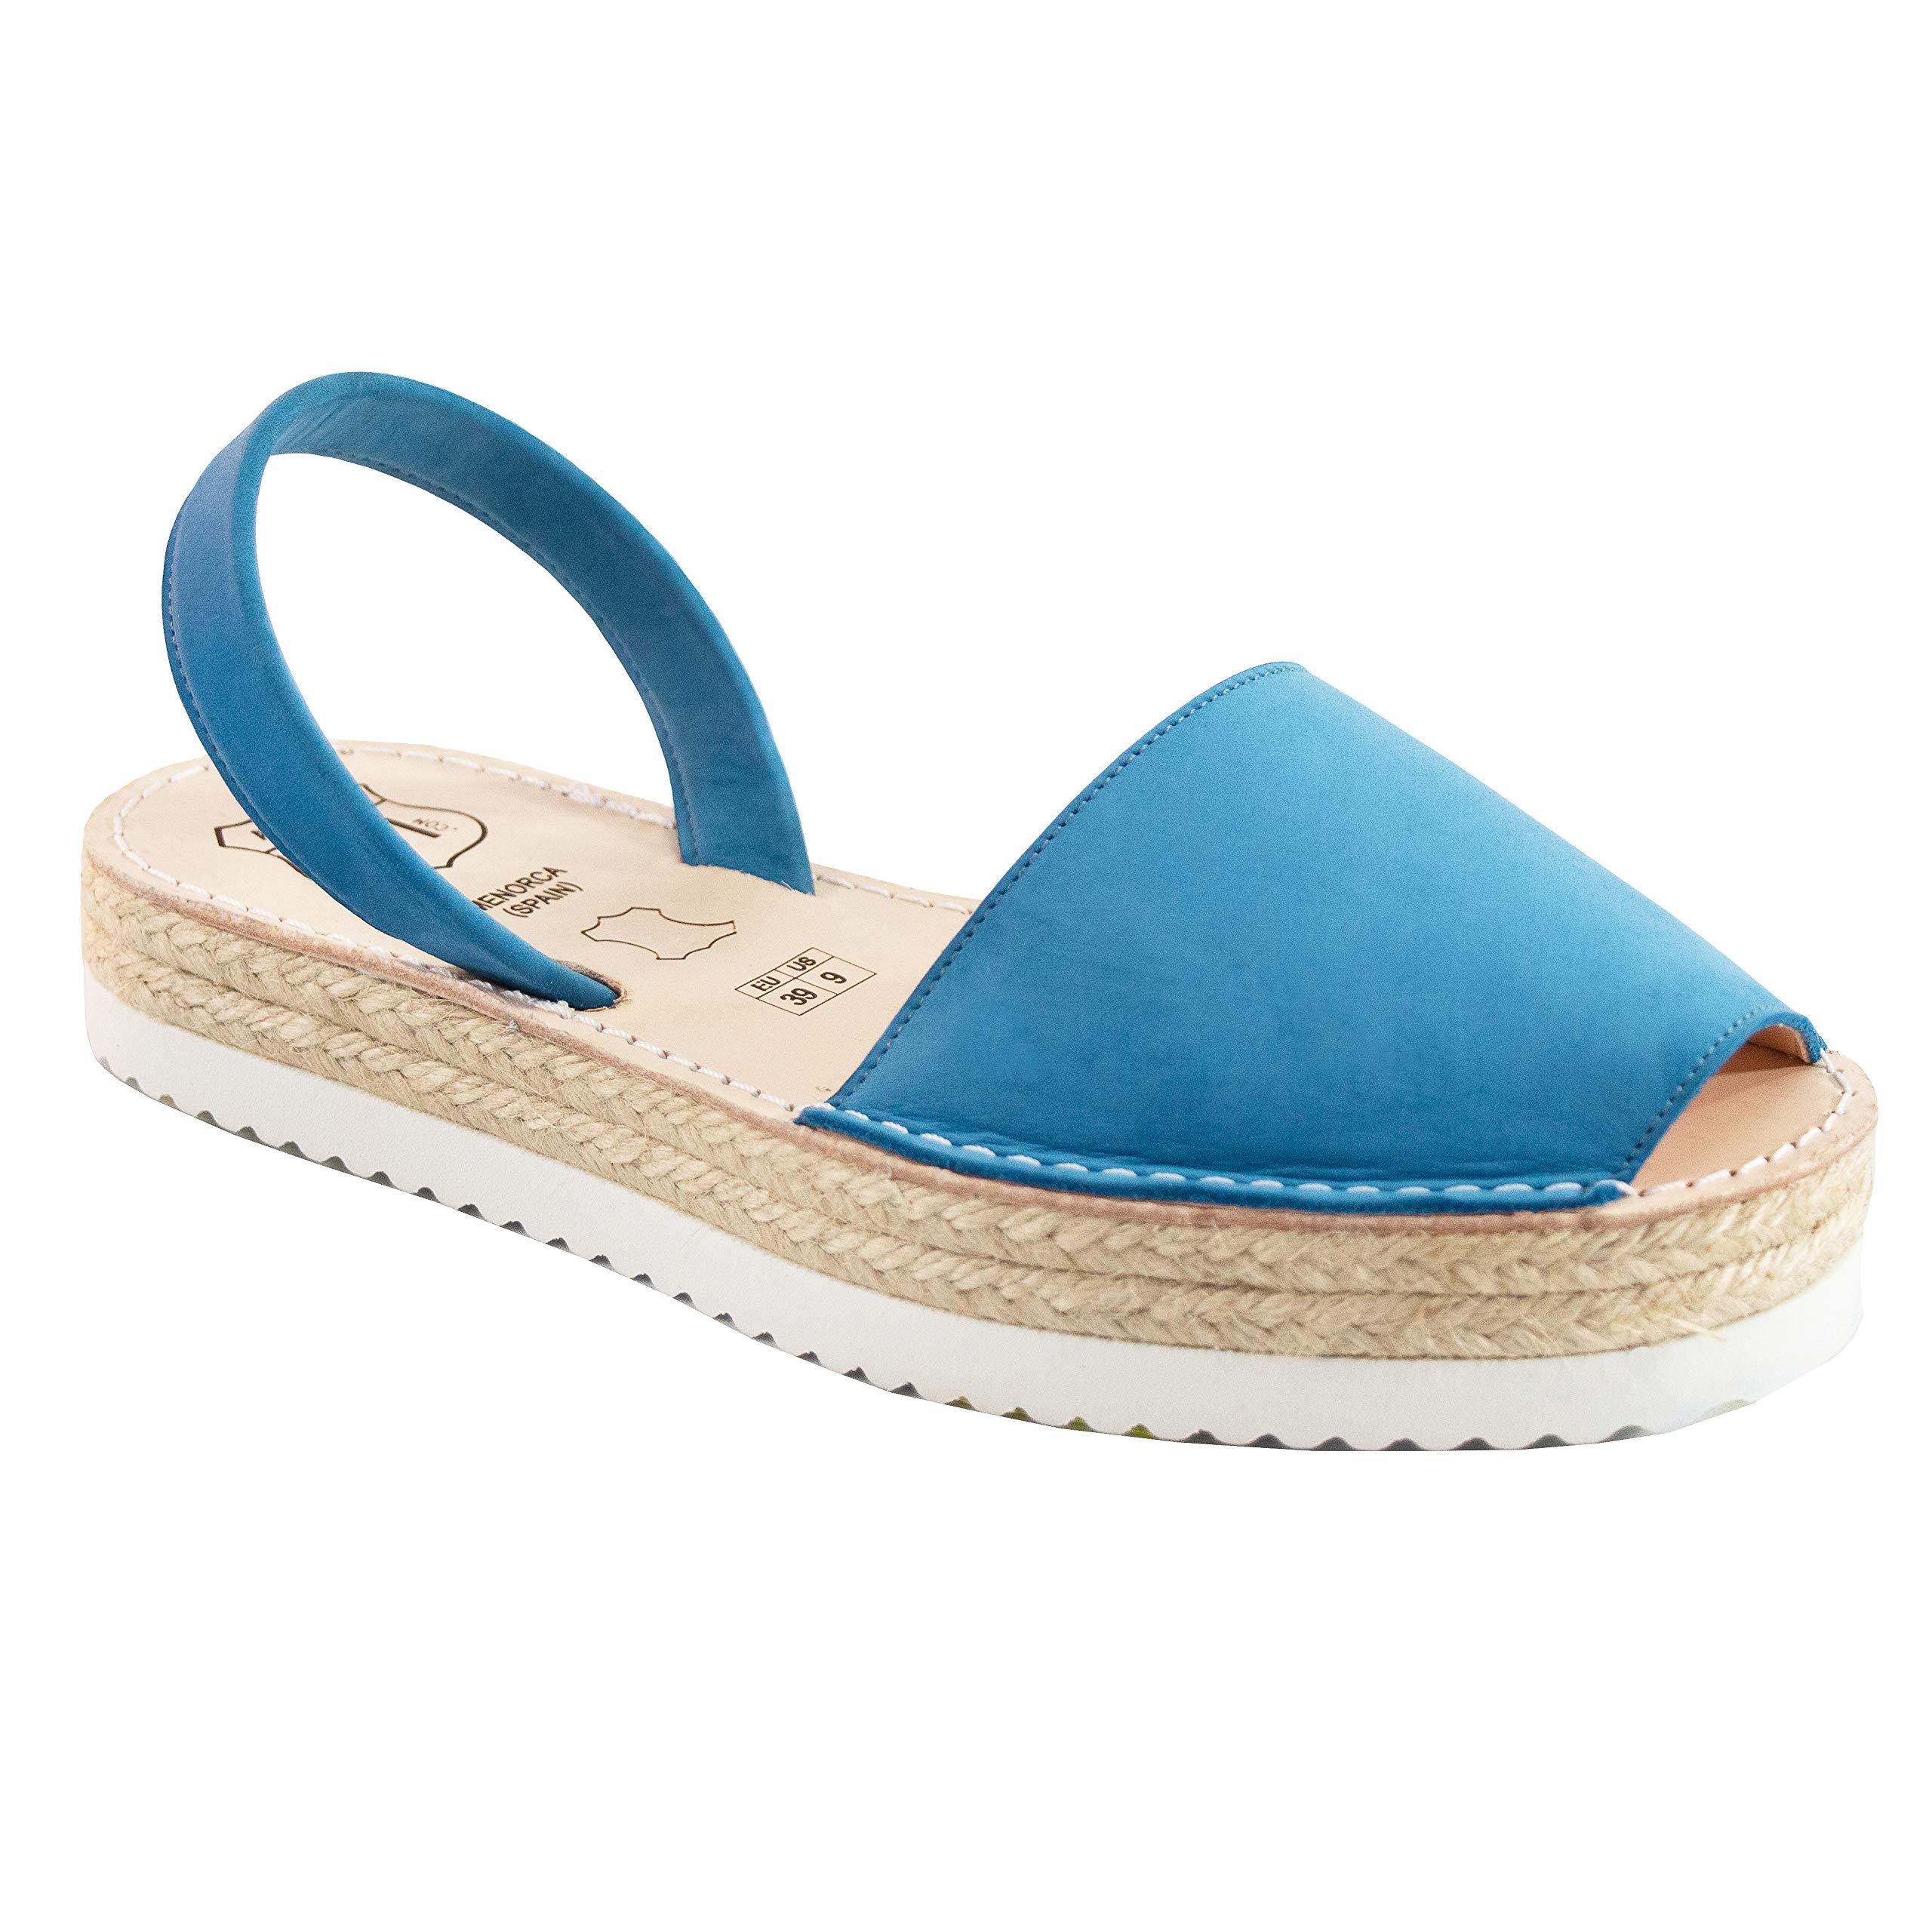 AVARCAS 101 Platforms - Artisan-Made Leather Espadrilles Avarca Sandals for Women